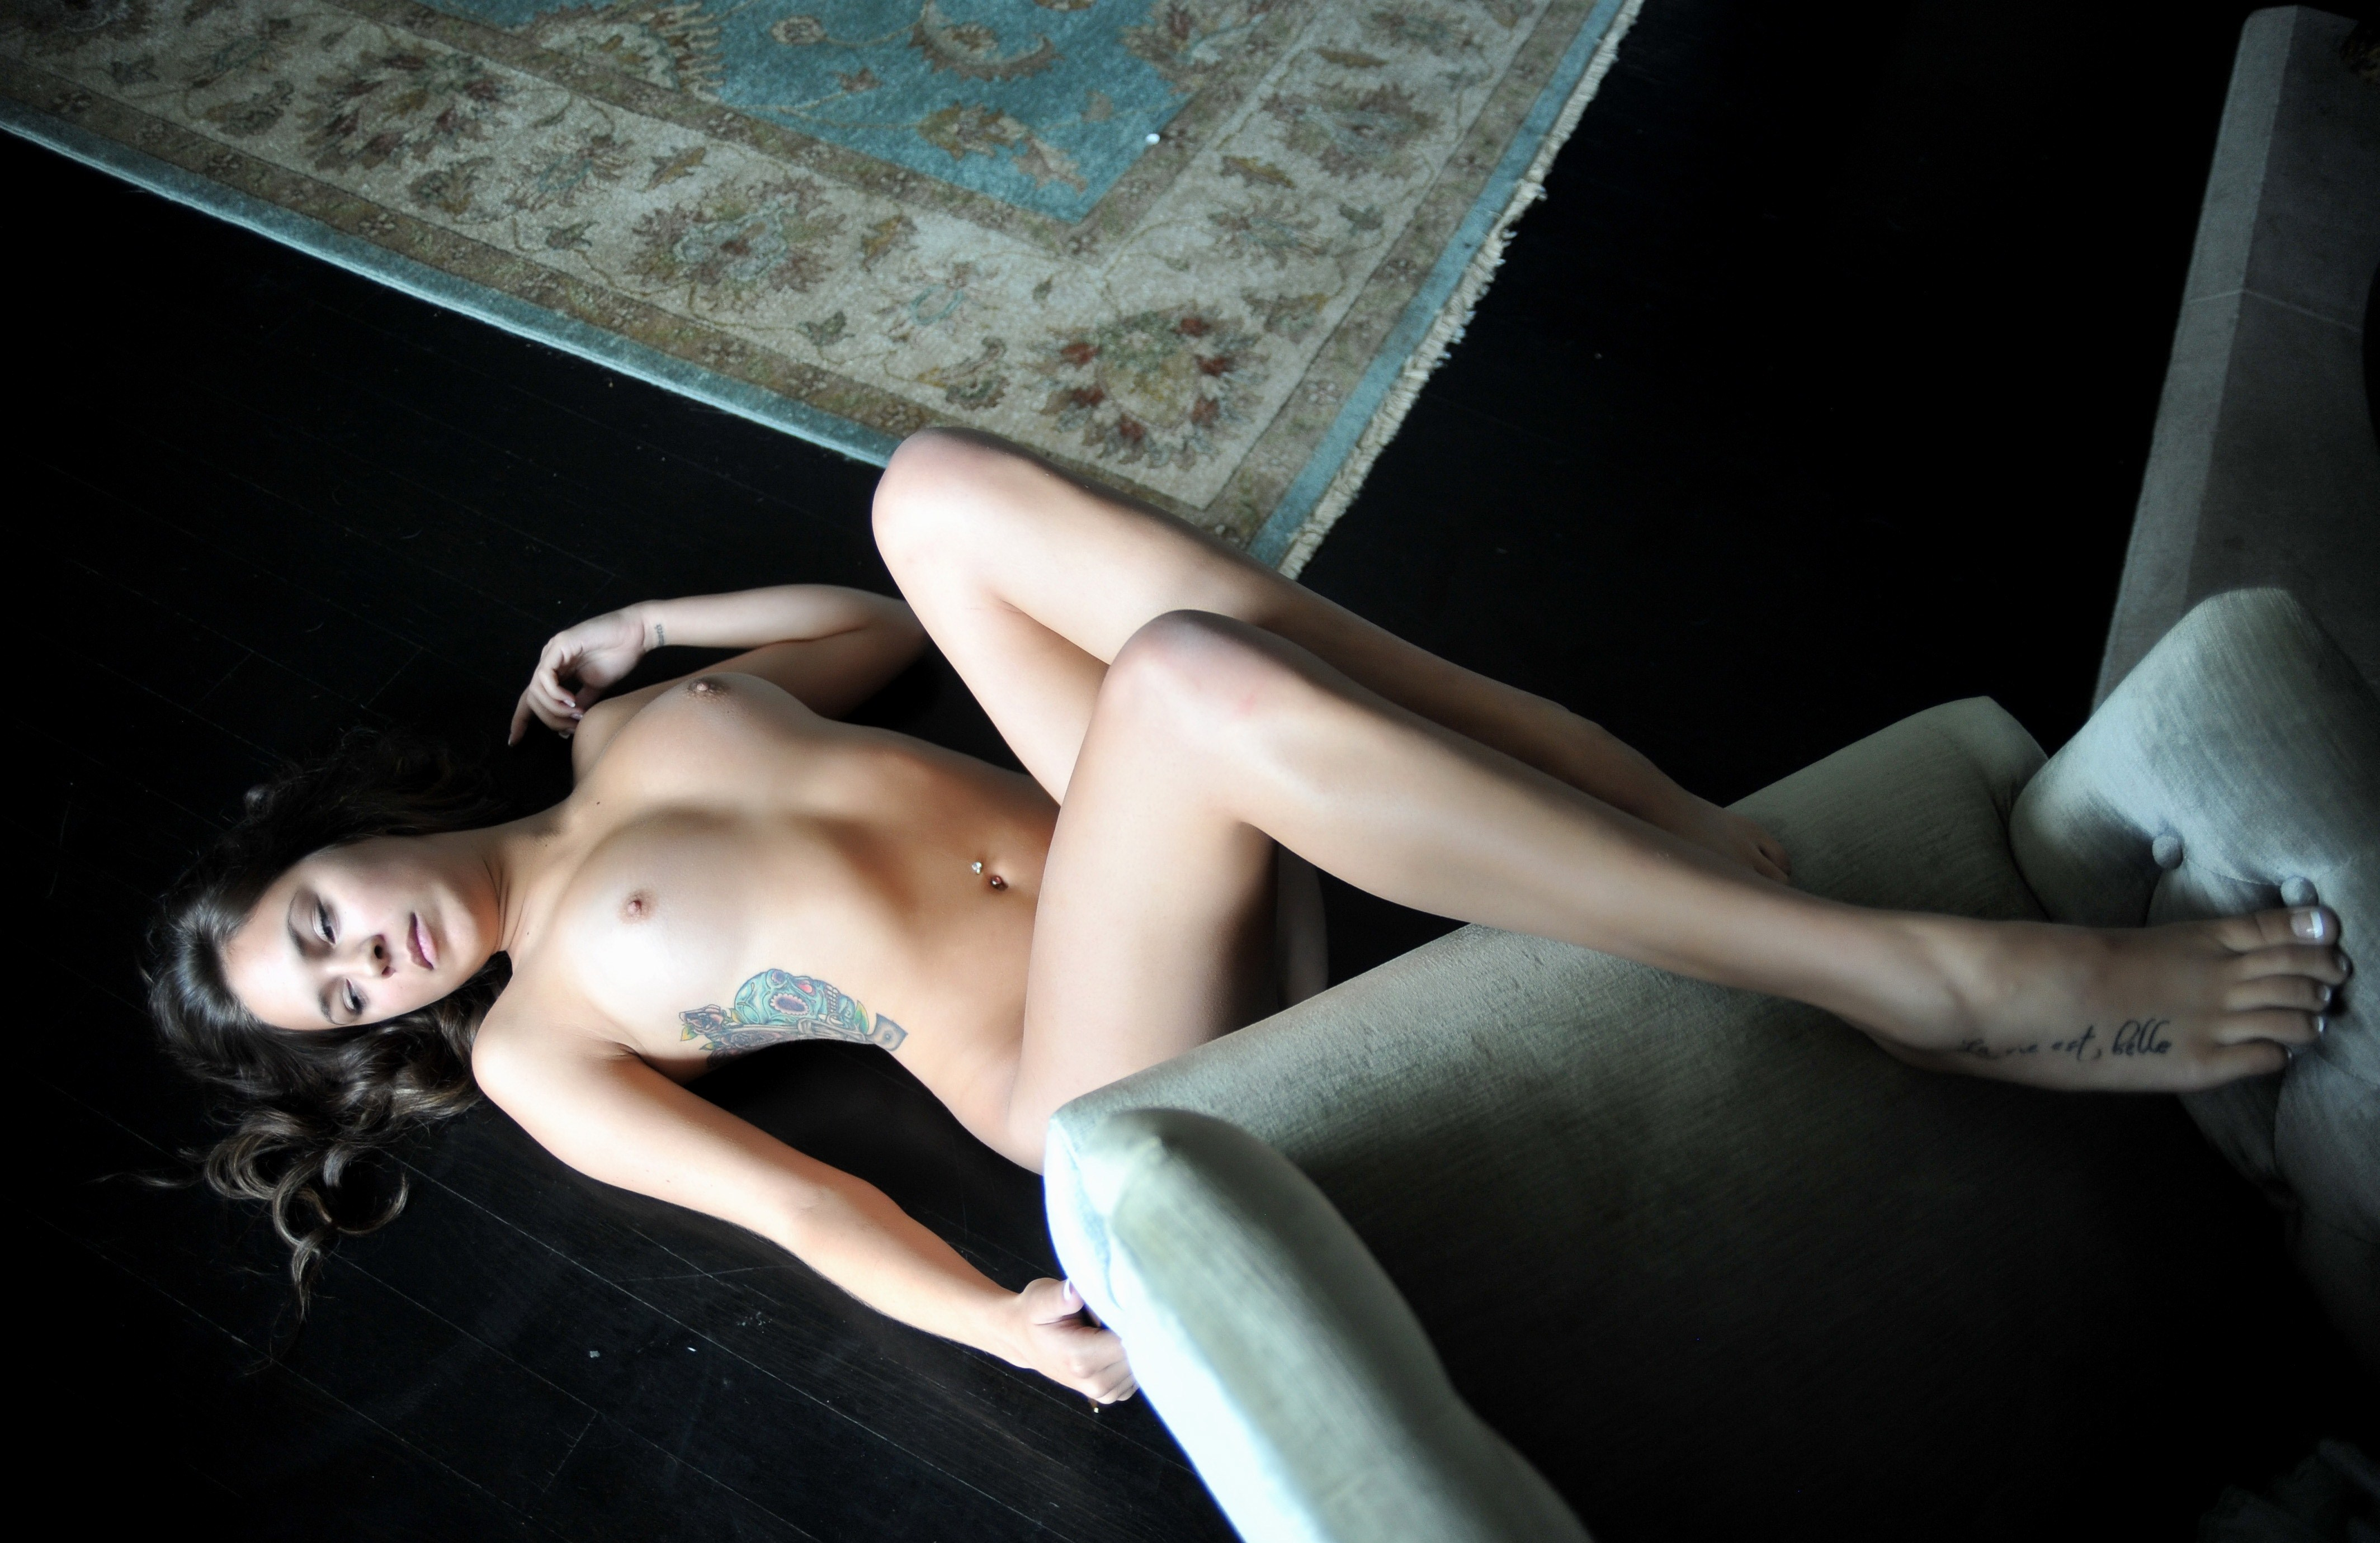 Чаи секс рулетка 3 фотография